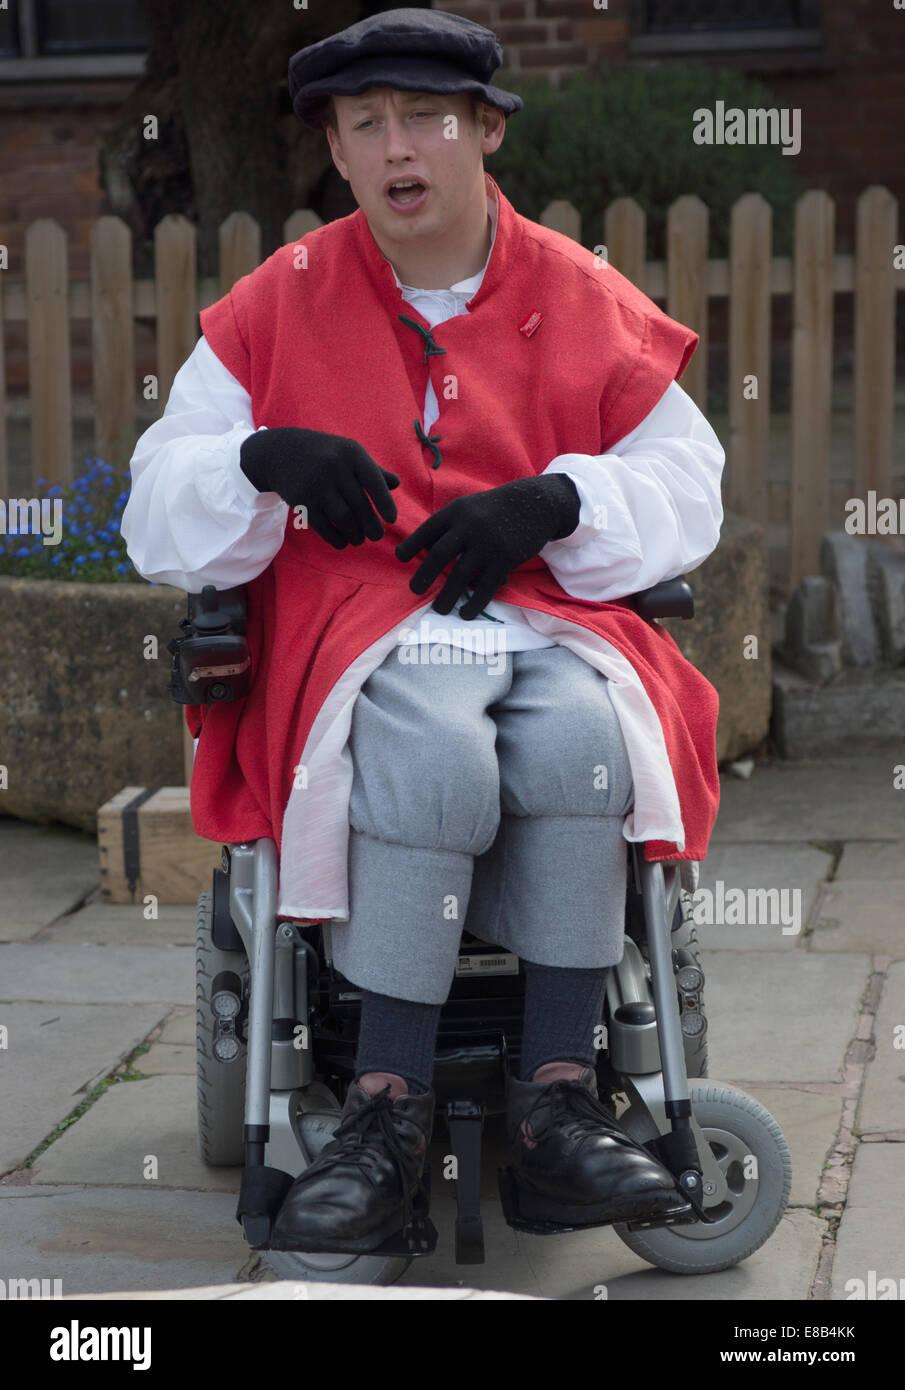 Schauspieler im Rollstuhl deaktiviert Shakespeare-Mimen Stockbild